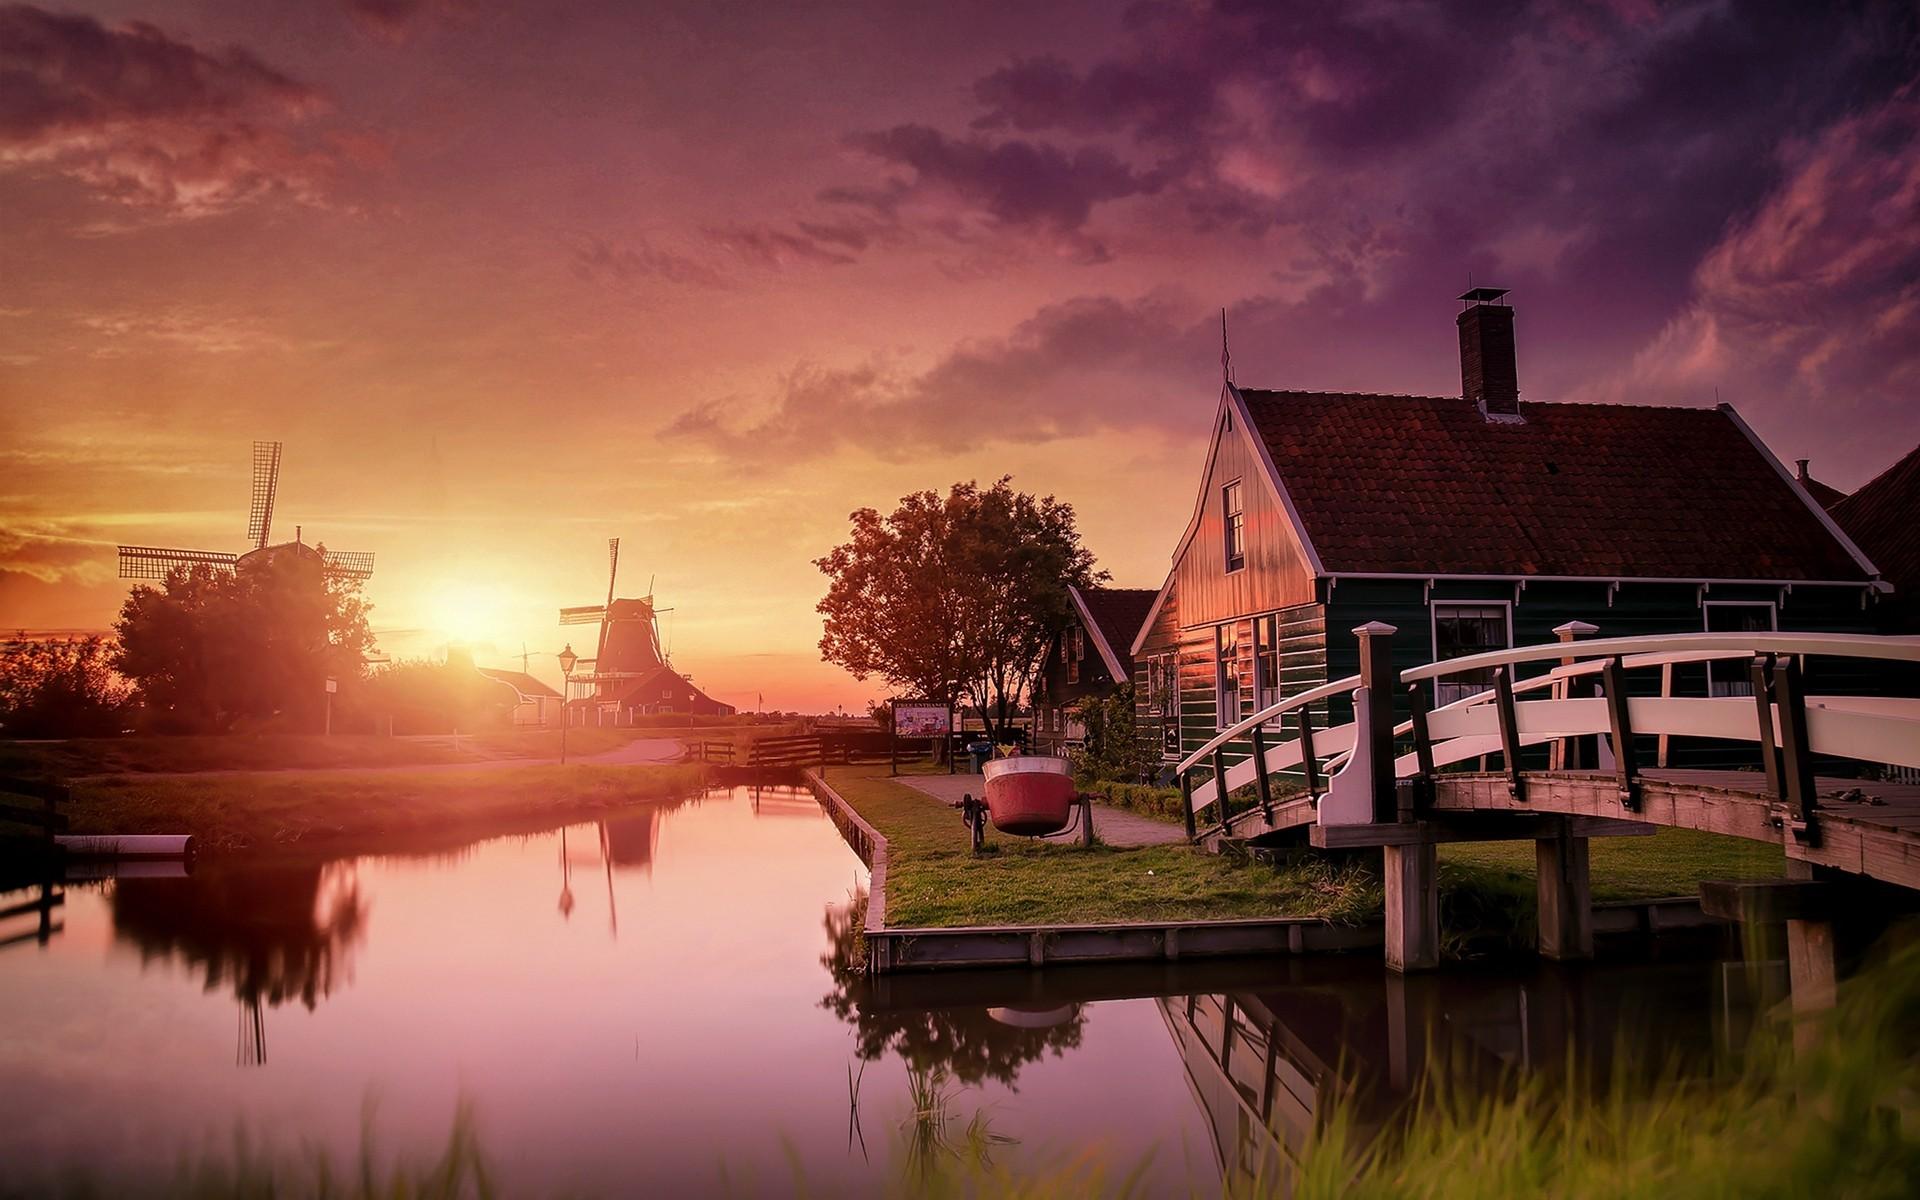 Nature, Landscape, Netherlands, Sunset, Windmills, Canal, Bridge, Water,